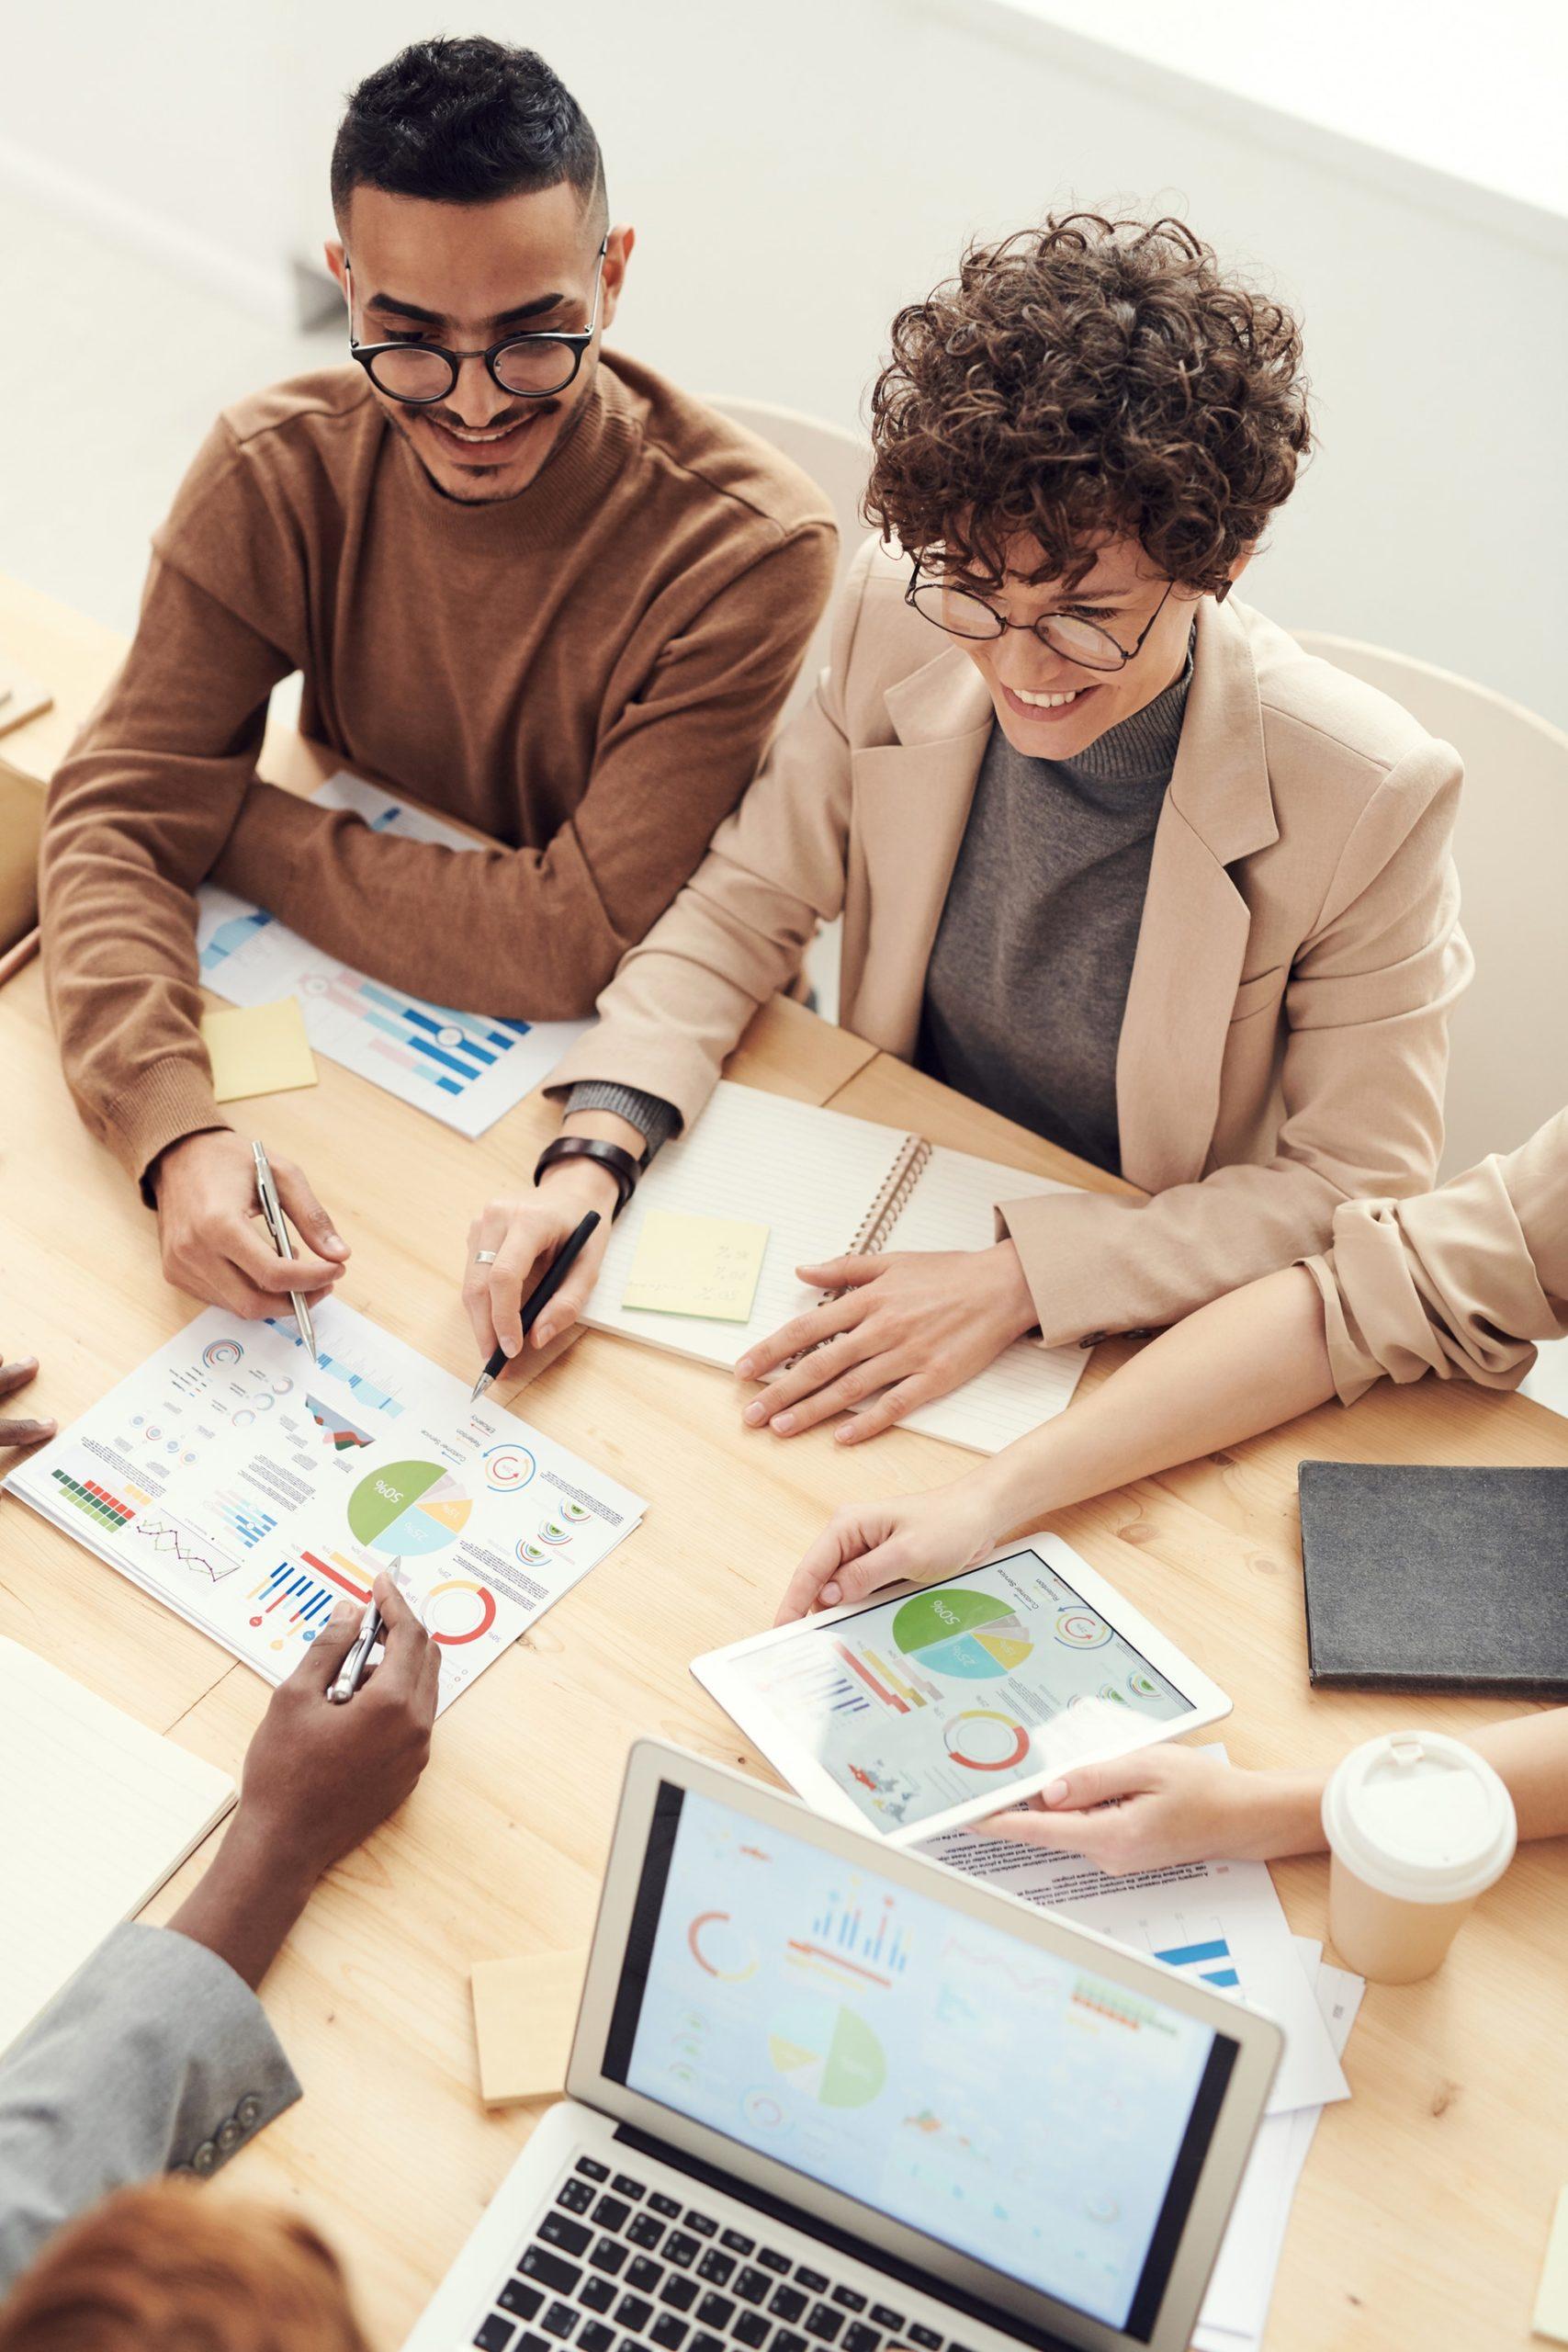 Recopilación de Data para Análisis de Mercado Inmobiliario